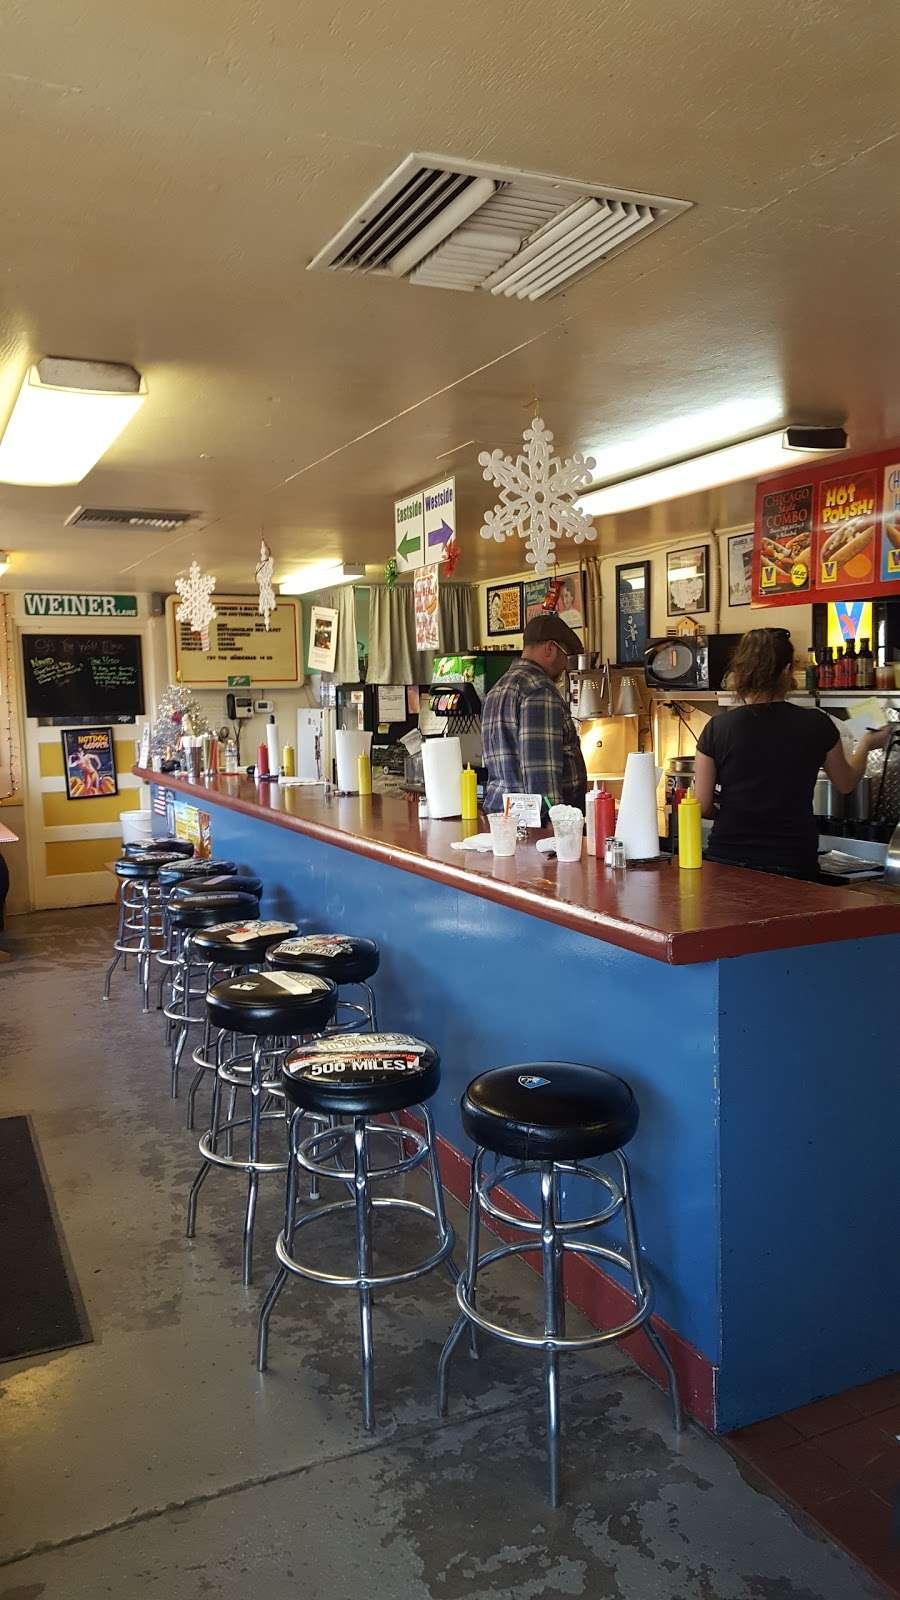 Roys Chicago Doggery & Italian Beef - meal takeaway  | Photo 5 of 10 | Address: 84 Corona Rd, Petaluma, CA 94954, USA | Phone: (707) 774-1574